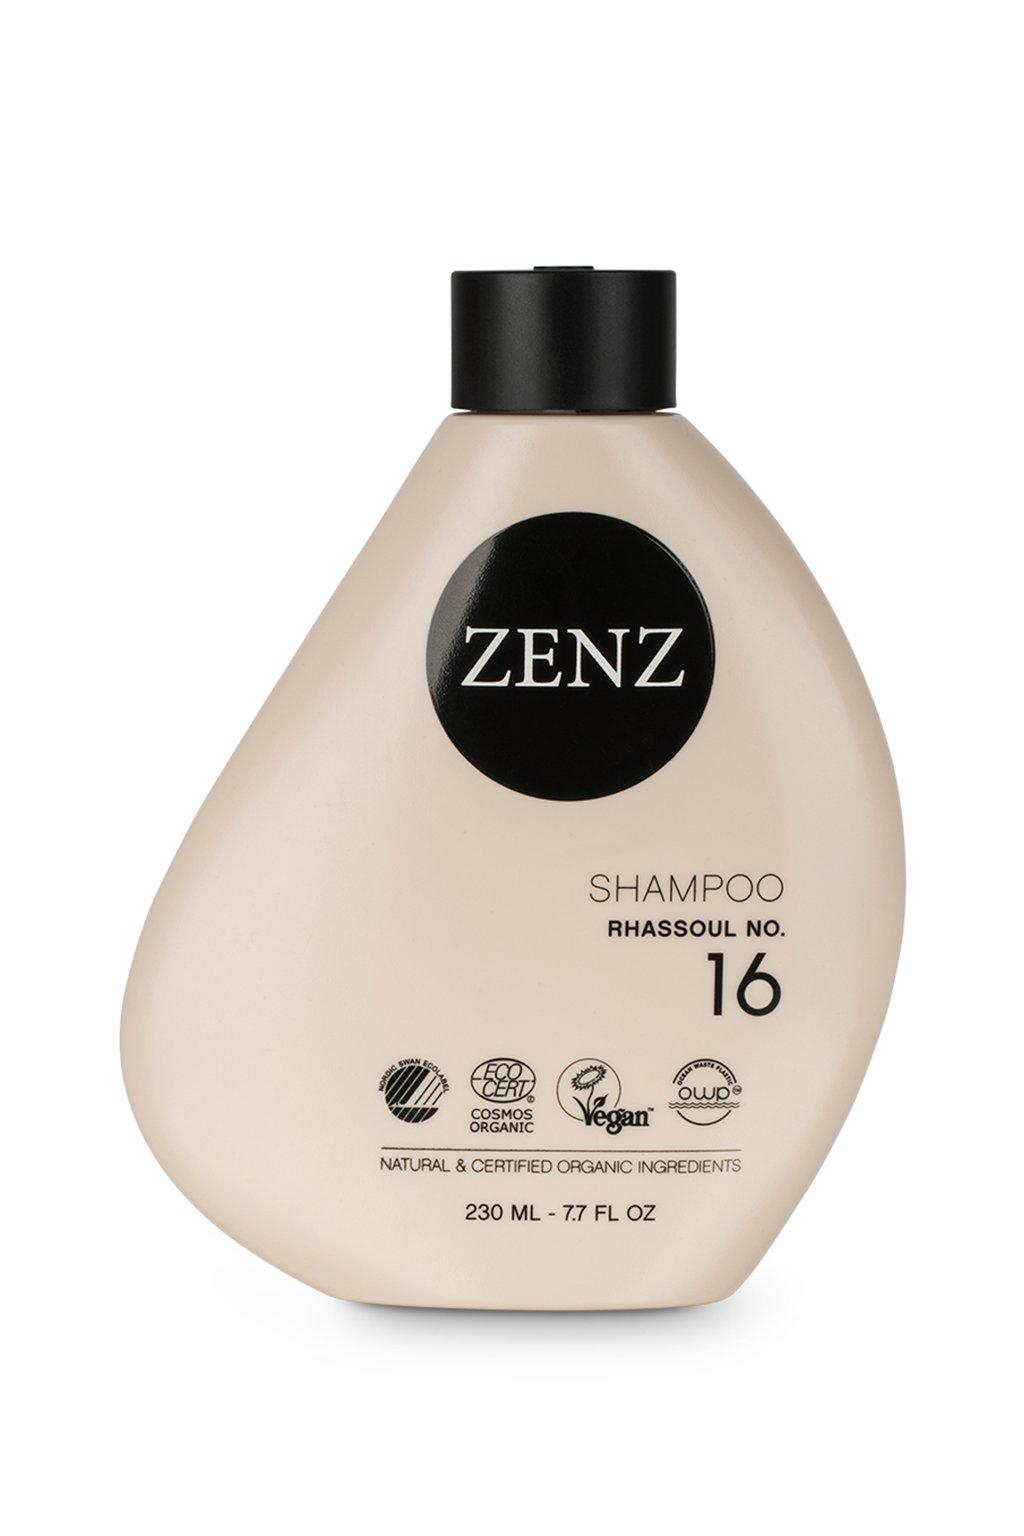 zenz no 16 rhassoul shampoo